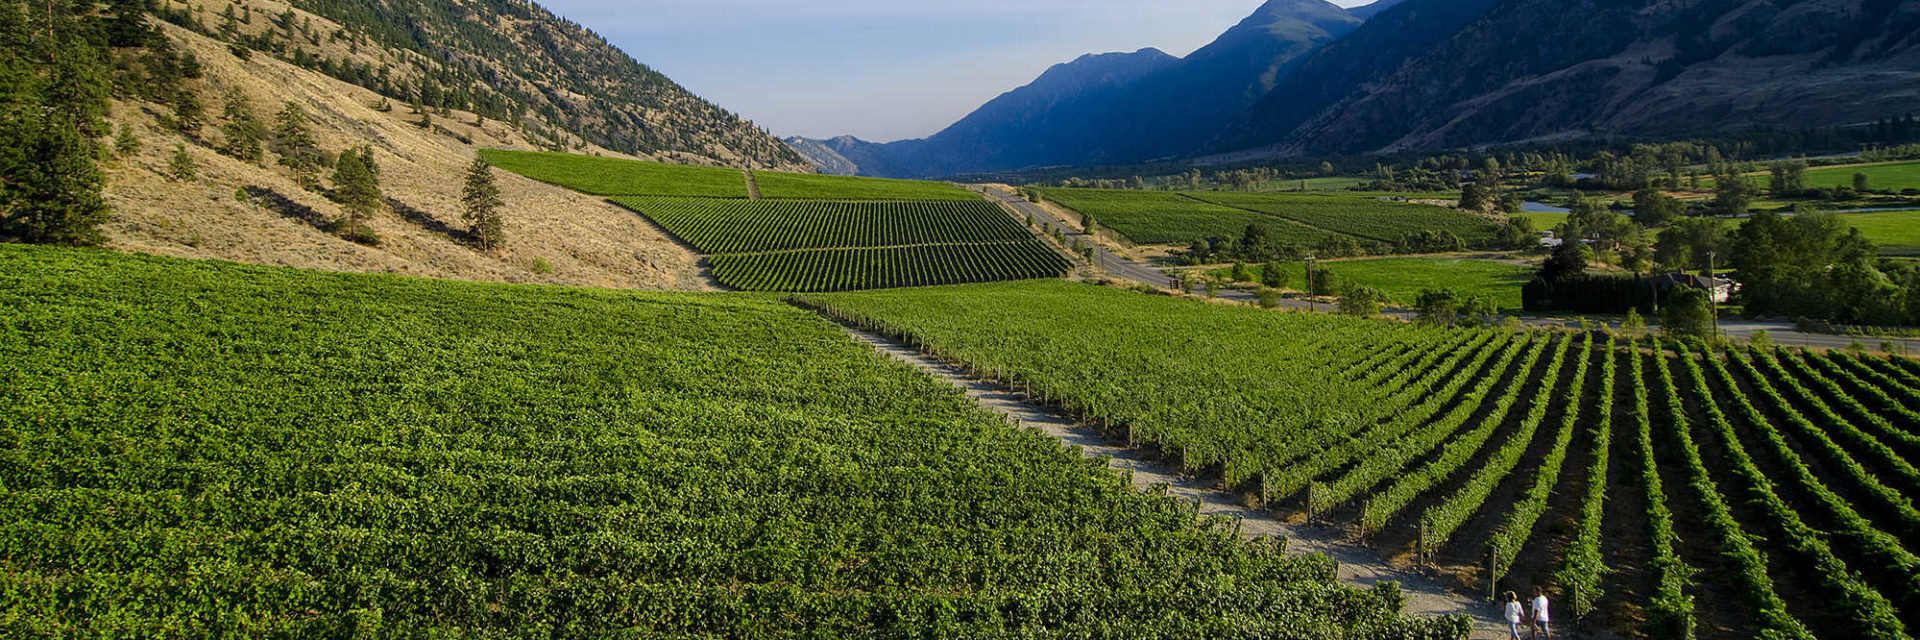 Similkameen Valley Wineries